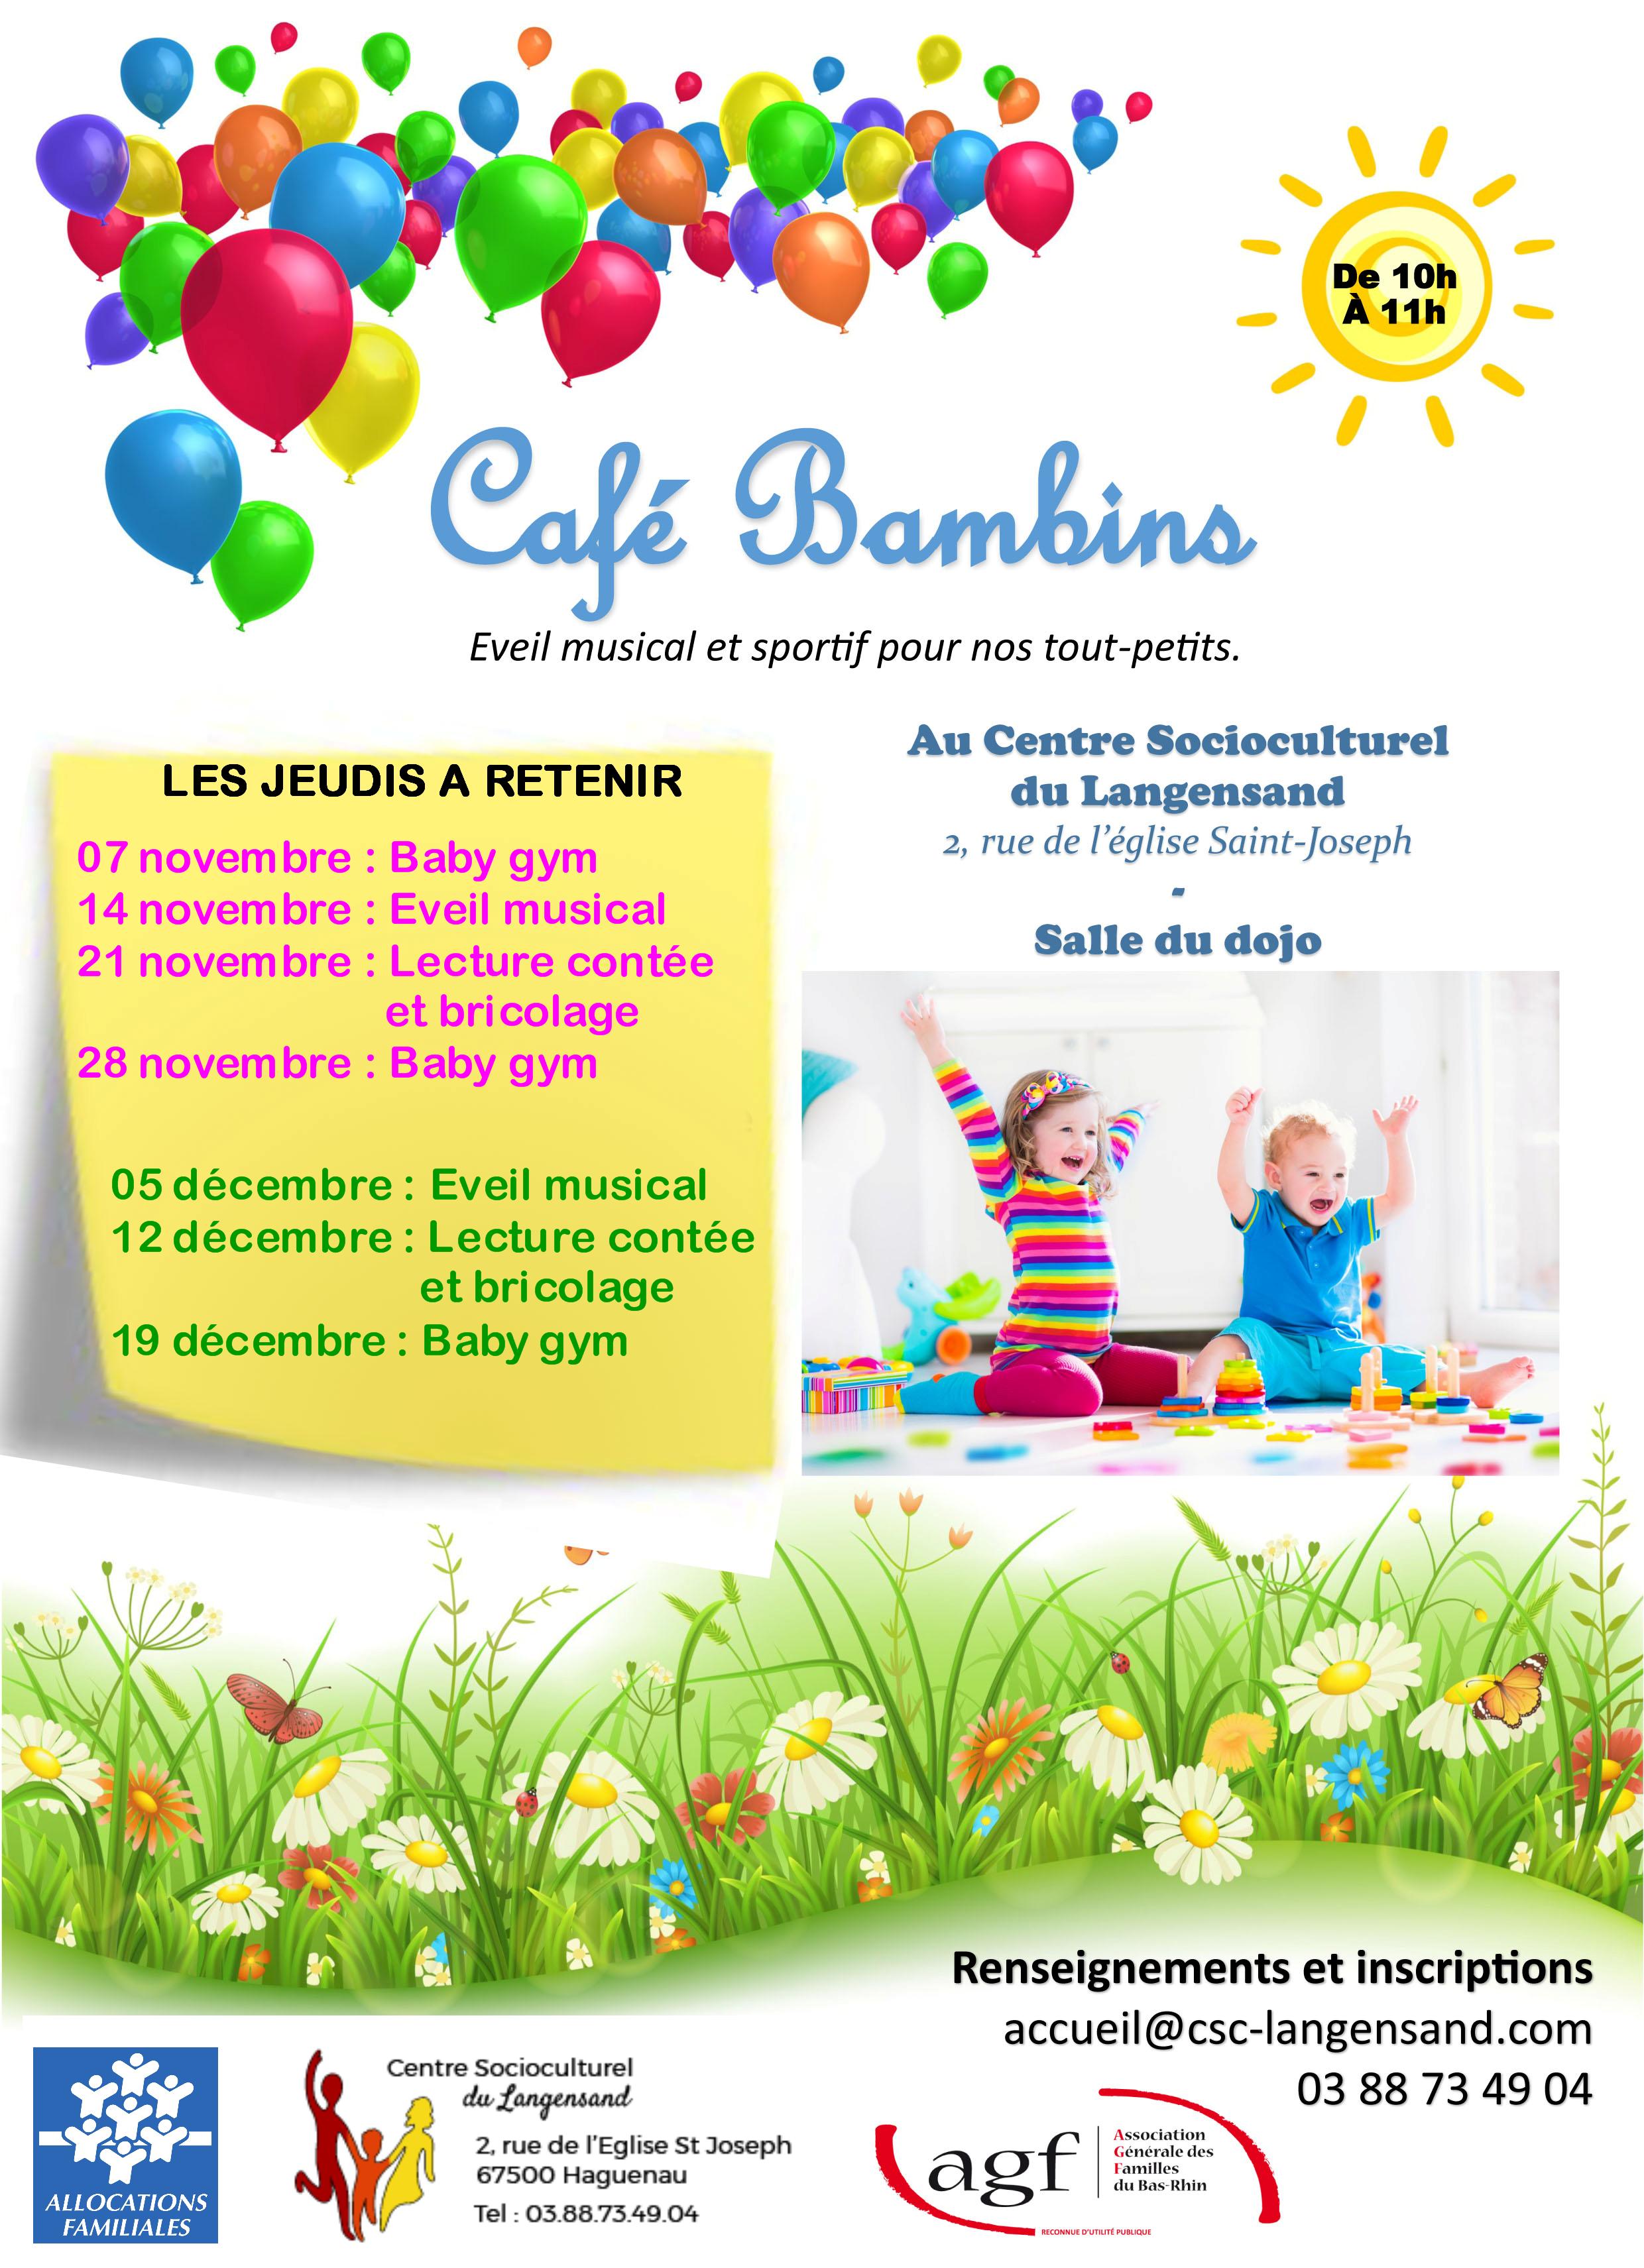 Ateliers « Café Bambins »